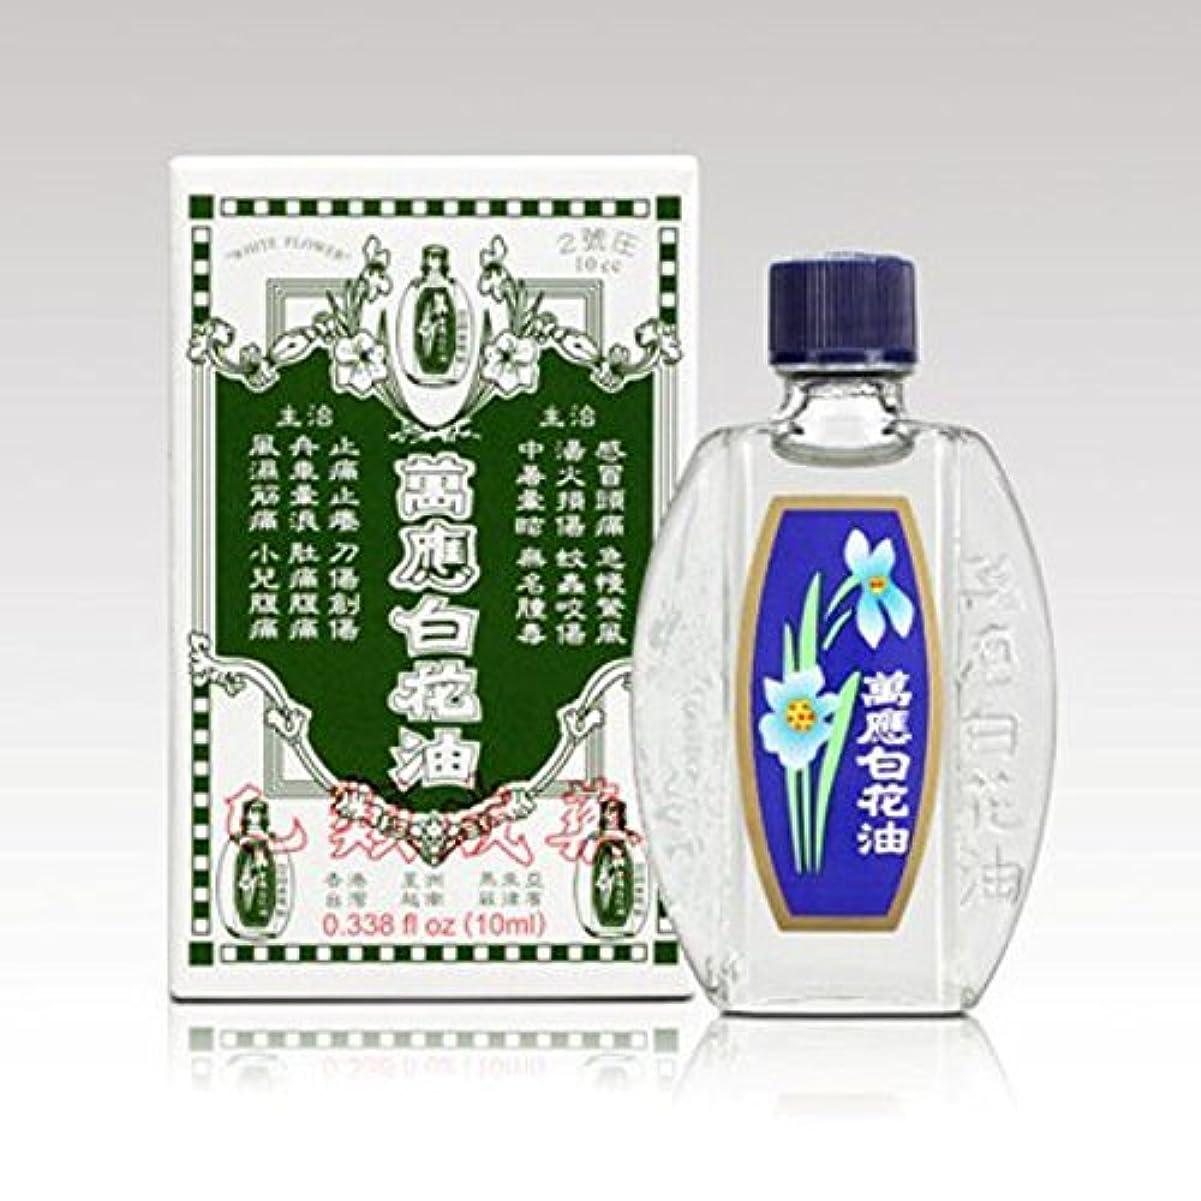 引き受ける感度香港台湾 純正版 白花油 10ml [並行輸入品]